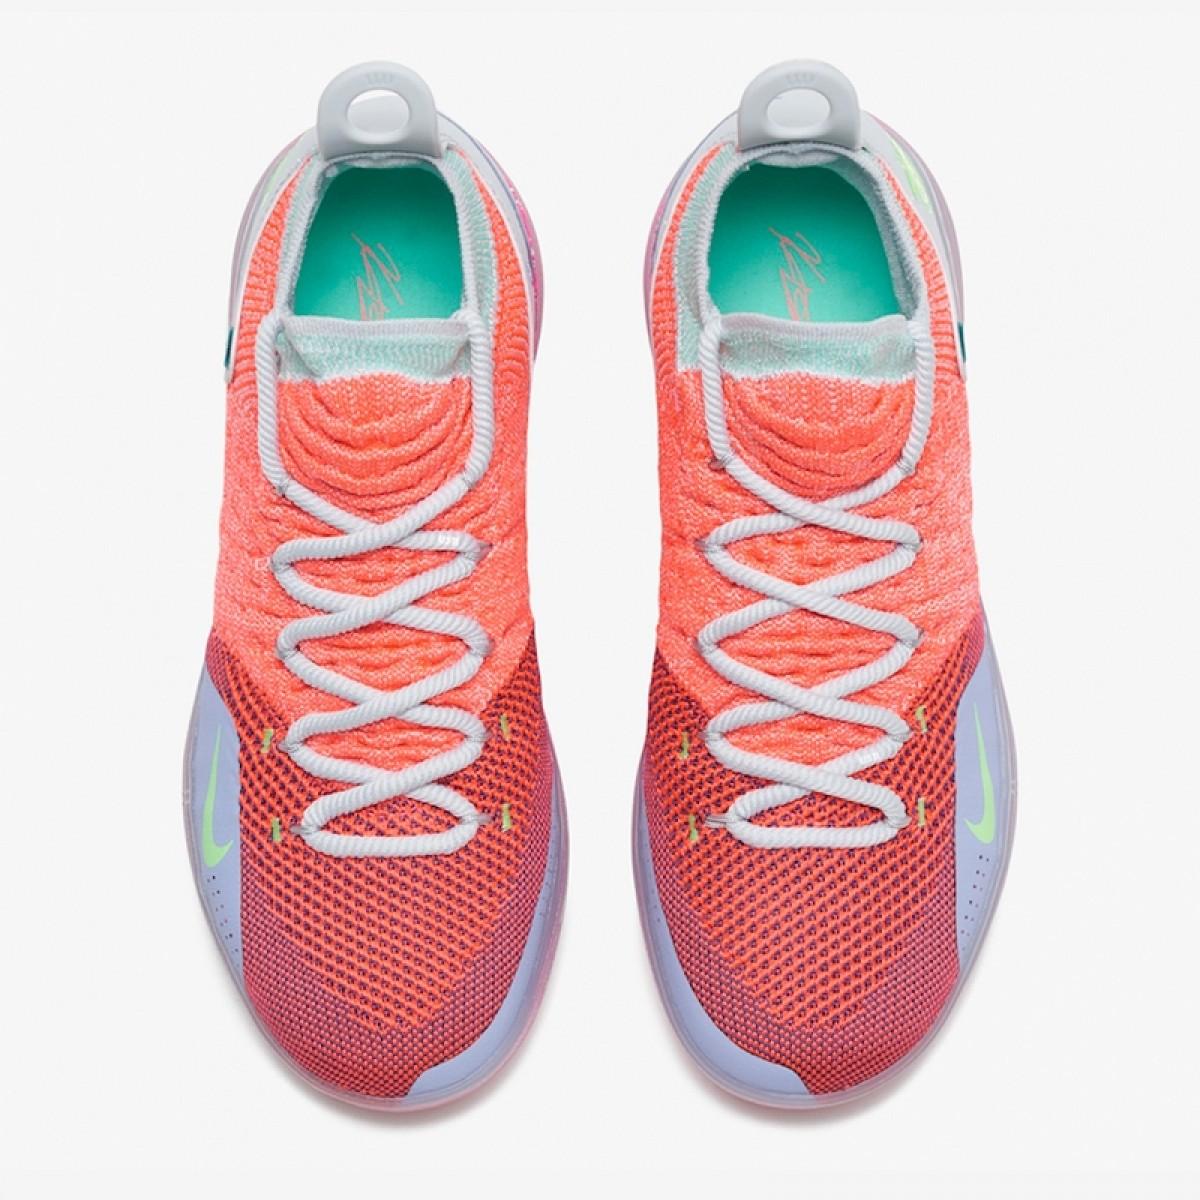 Nike KD 11 'EYBL' AO2604-600